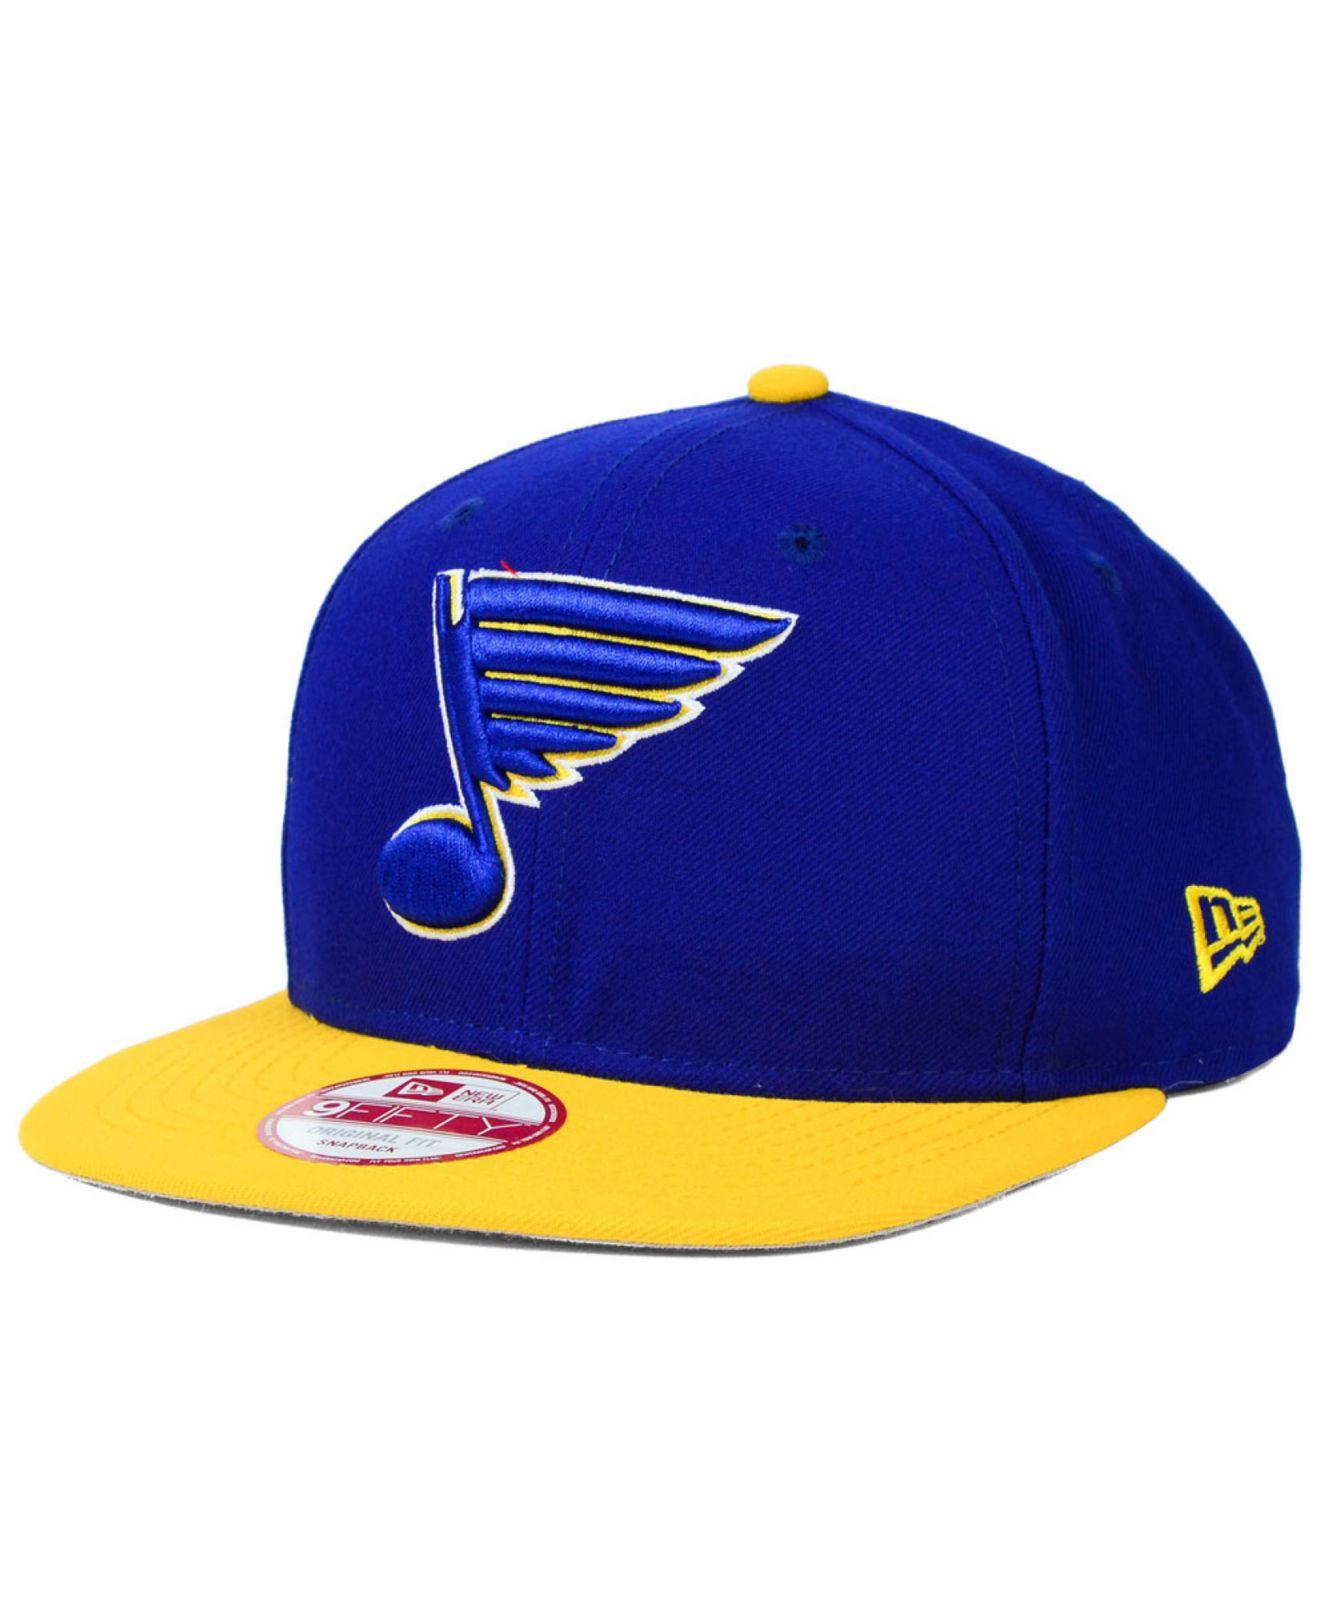 official photos 18052 83d18 ... canada lyst ktz st. louis blues prop 9fifty snapback cap in blue for  men 31b2a